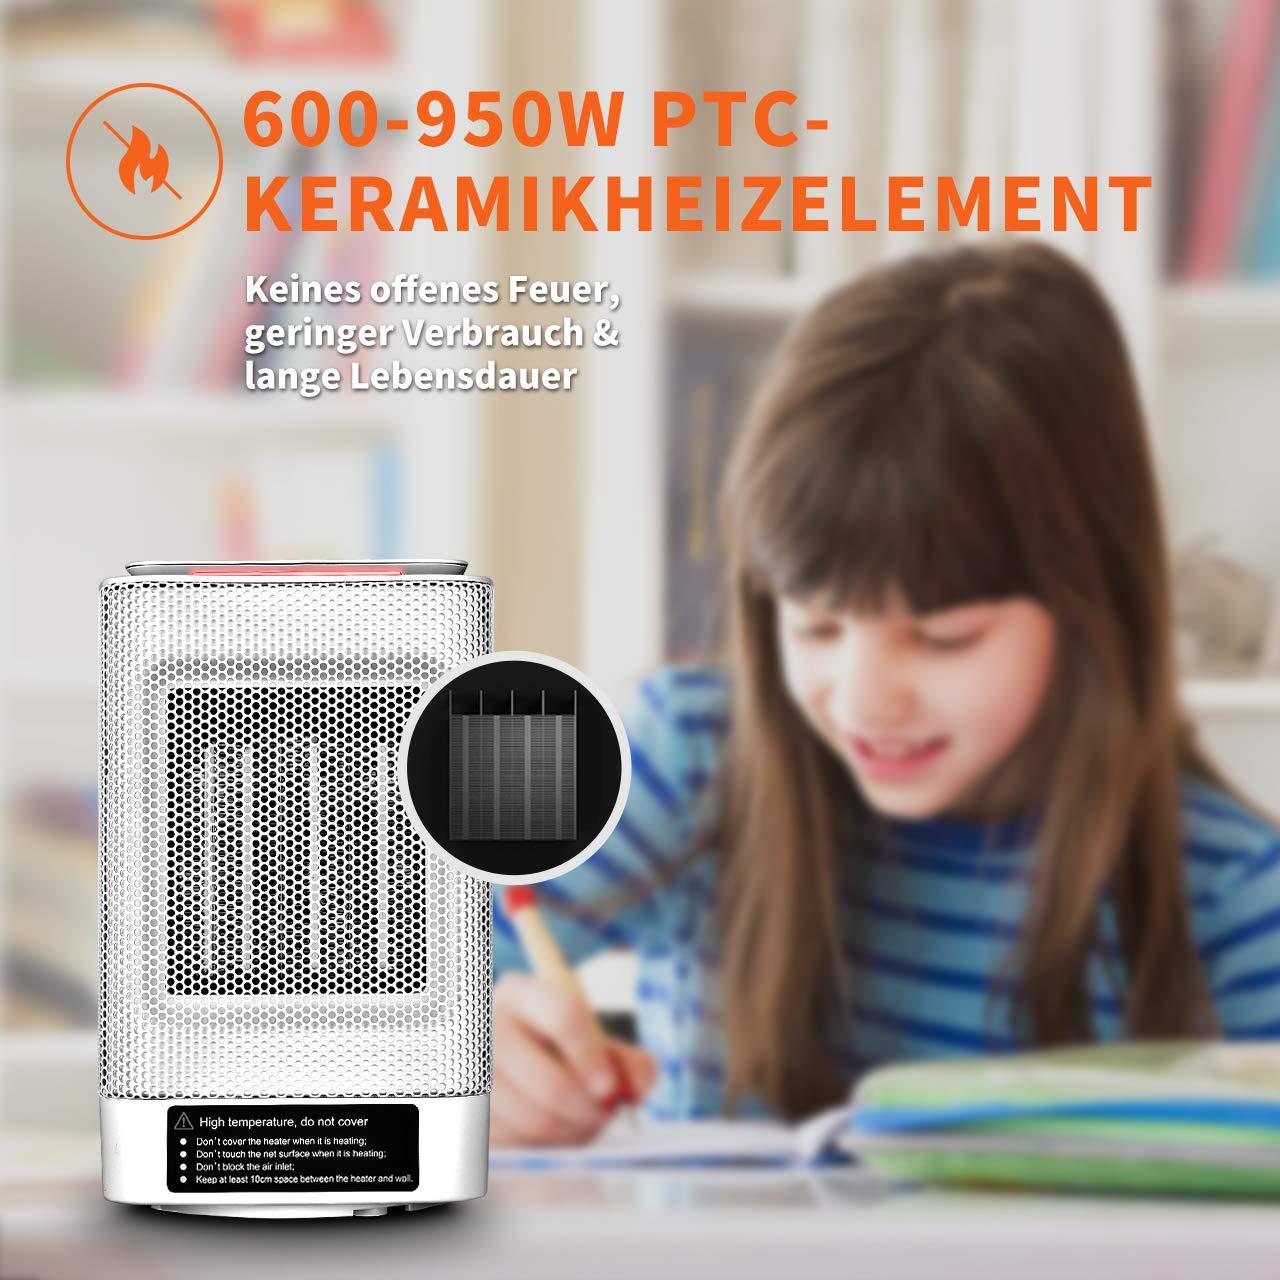 douhe 600w heizlfter mini heizung elektroheizer heizgert. Black Bedroom Furniture Sets. Home Design Ideas